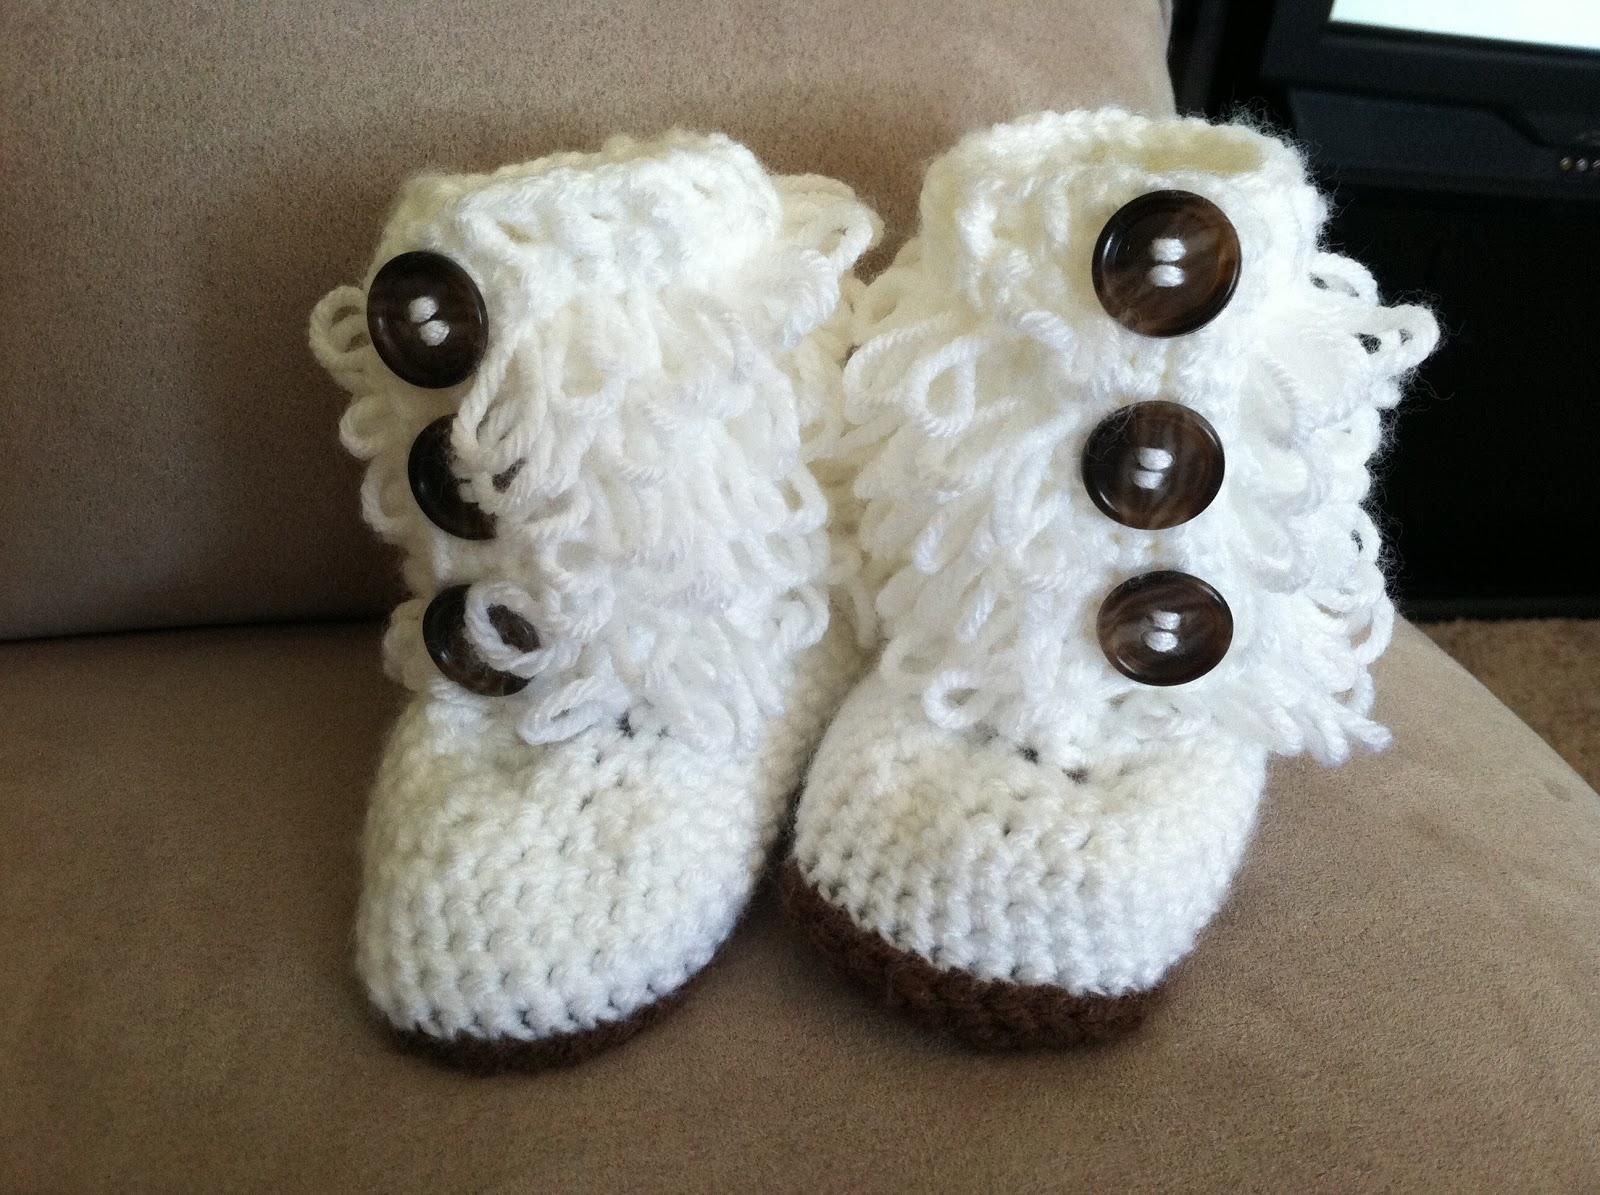 Crocheting Baby Stuff : Crochet Baby Boots